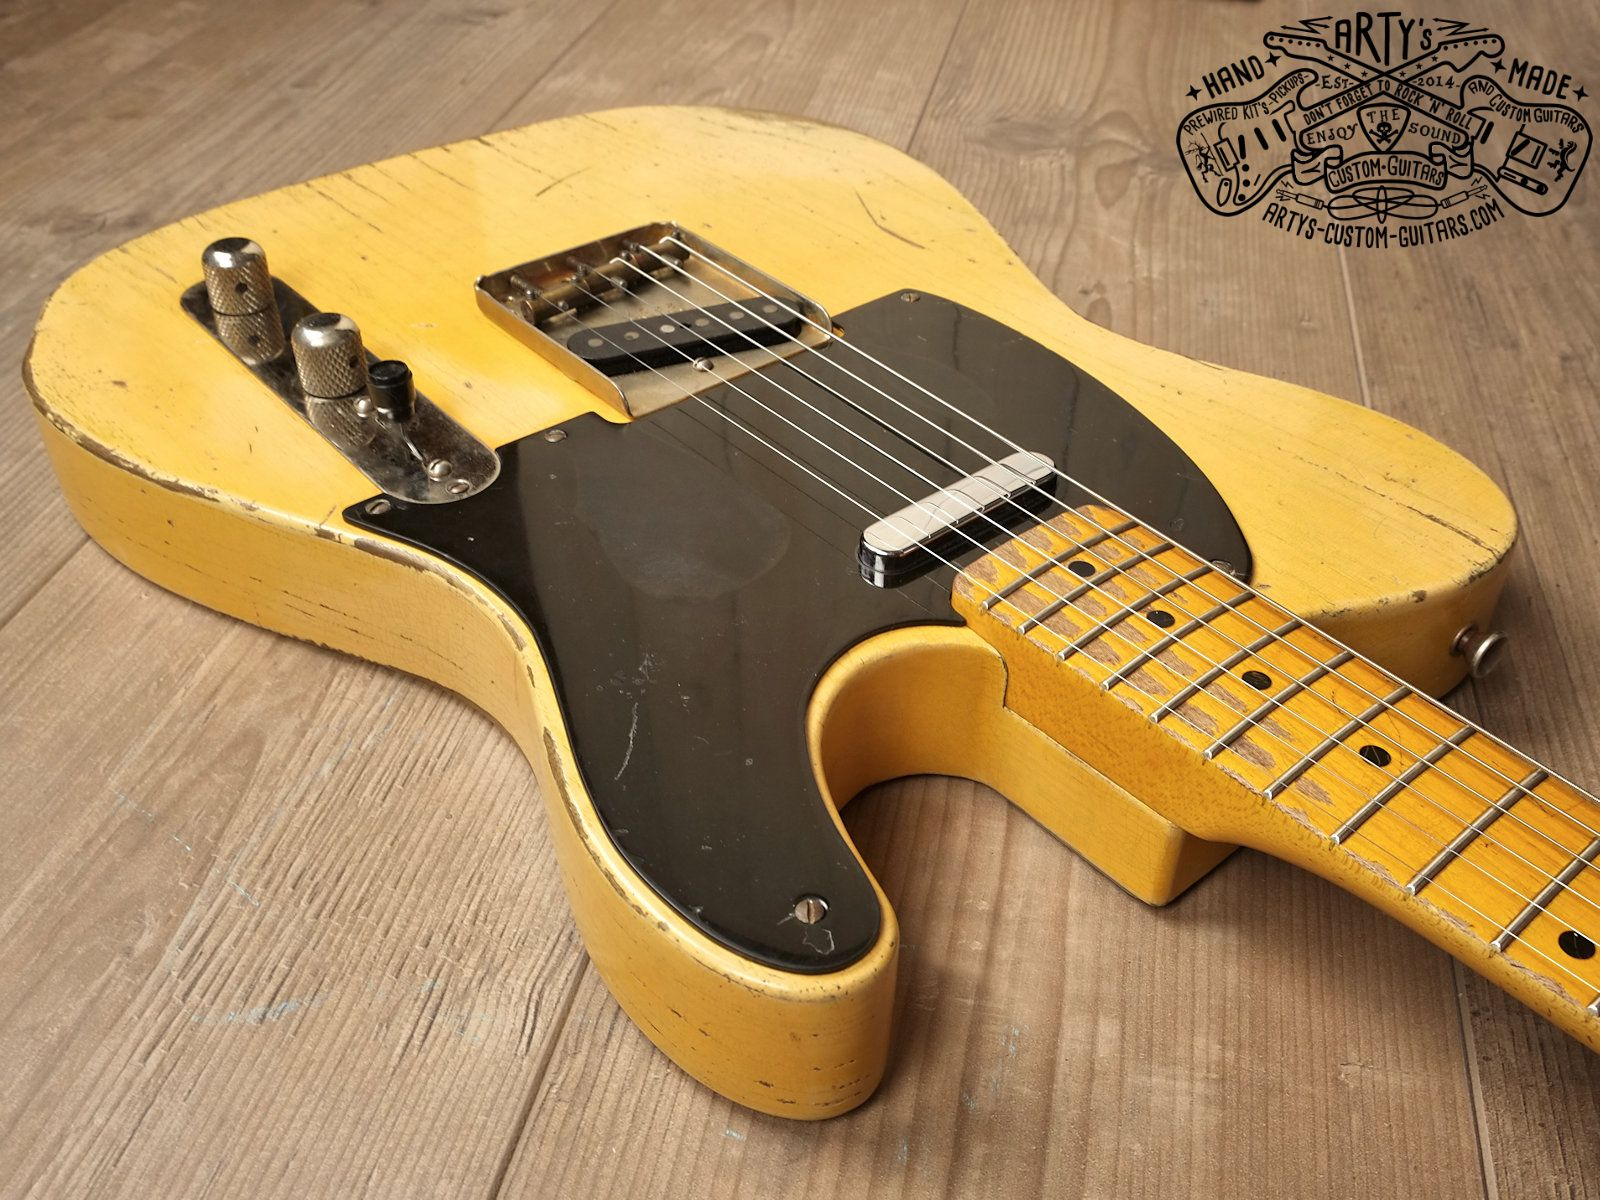 small resolution of broadcaster butterscotch blonde telecaster heavy relic tele maple neck swamp ash body bakelite pickguard aged nitro finish arty s custom guitars